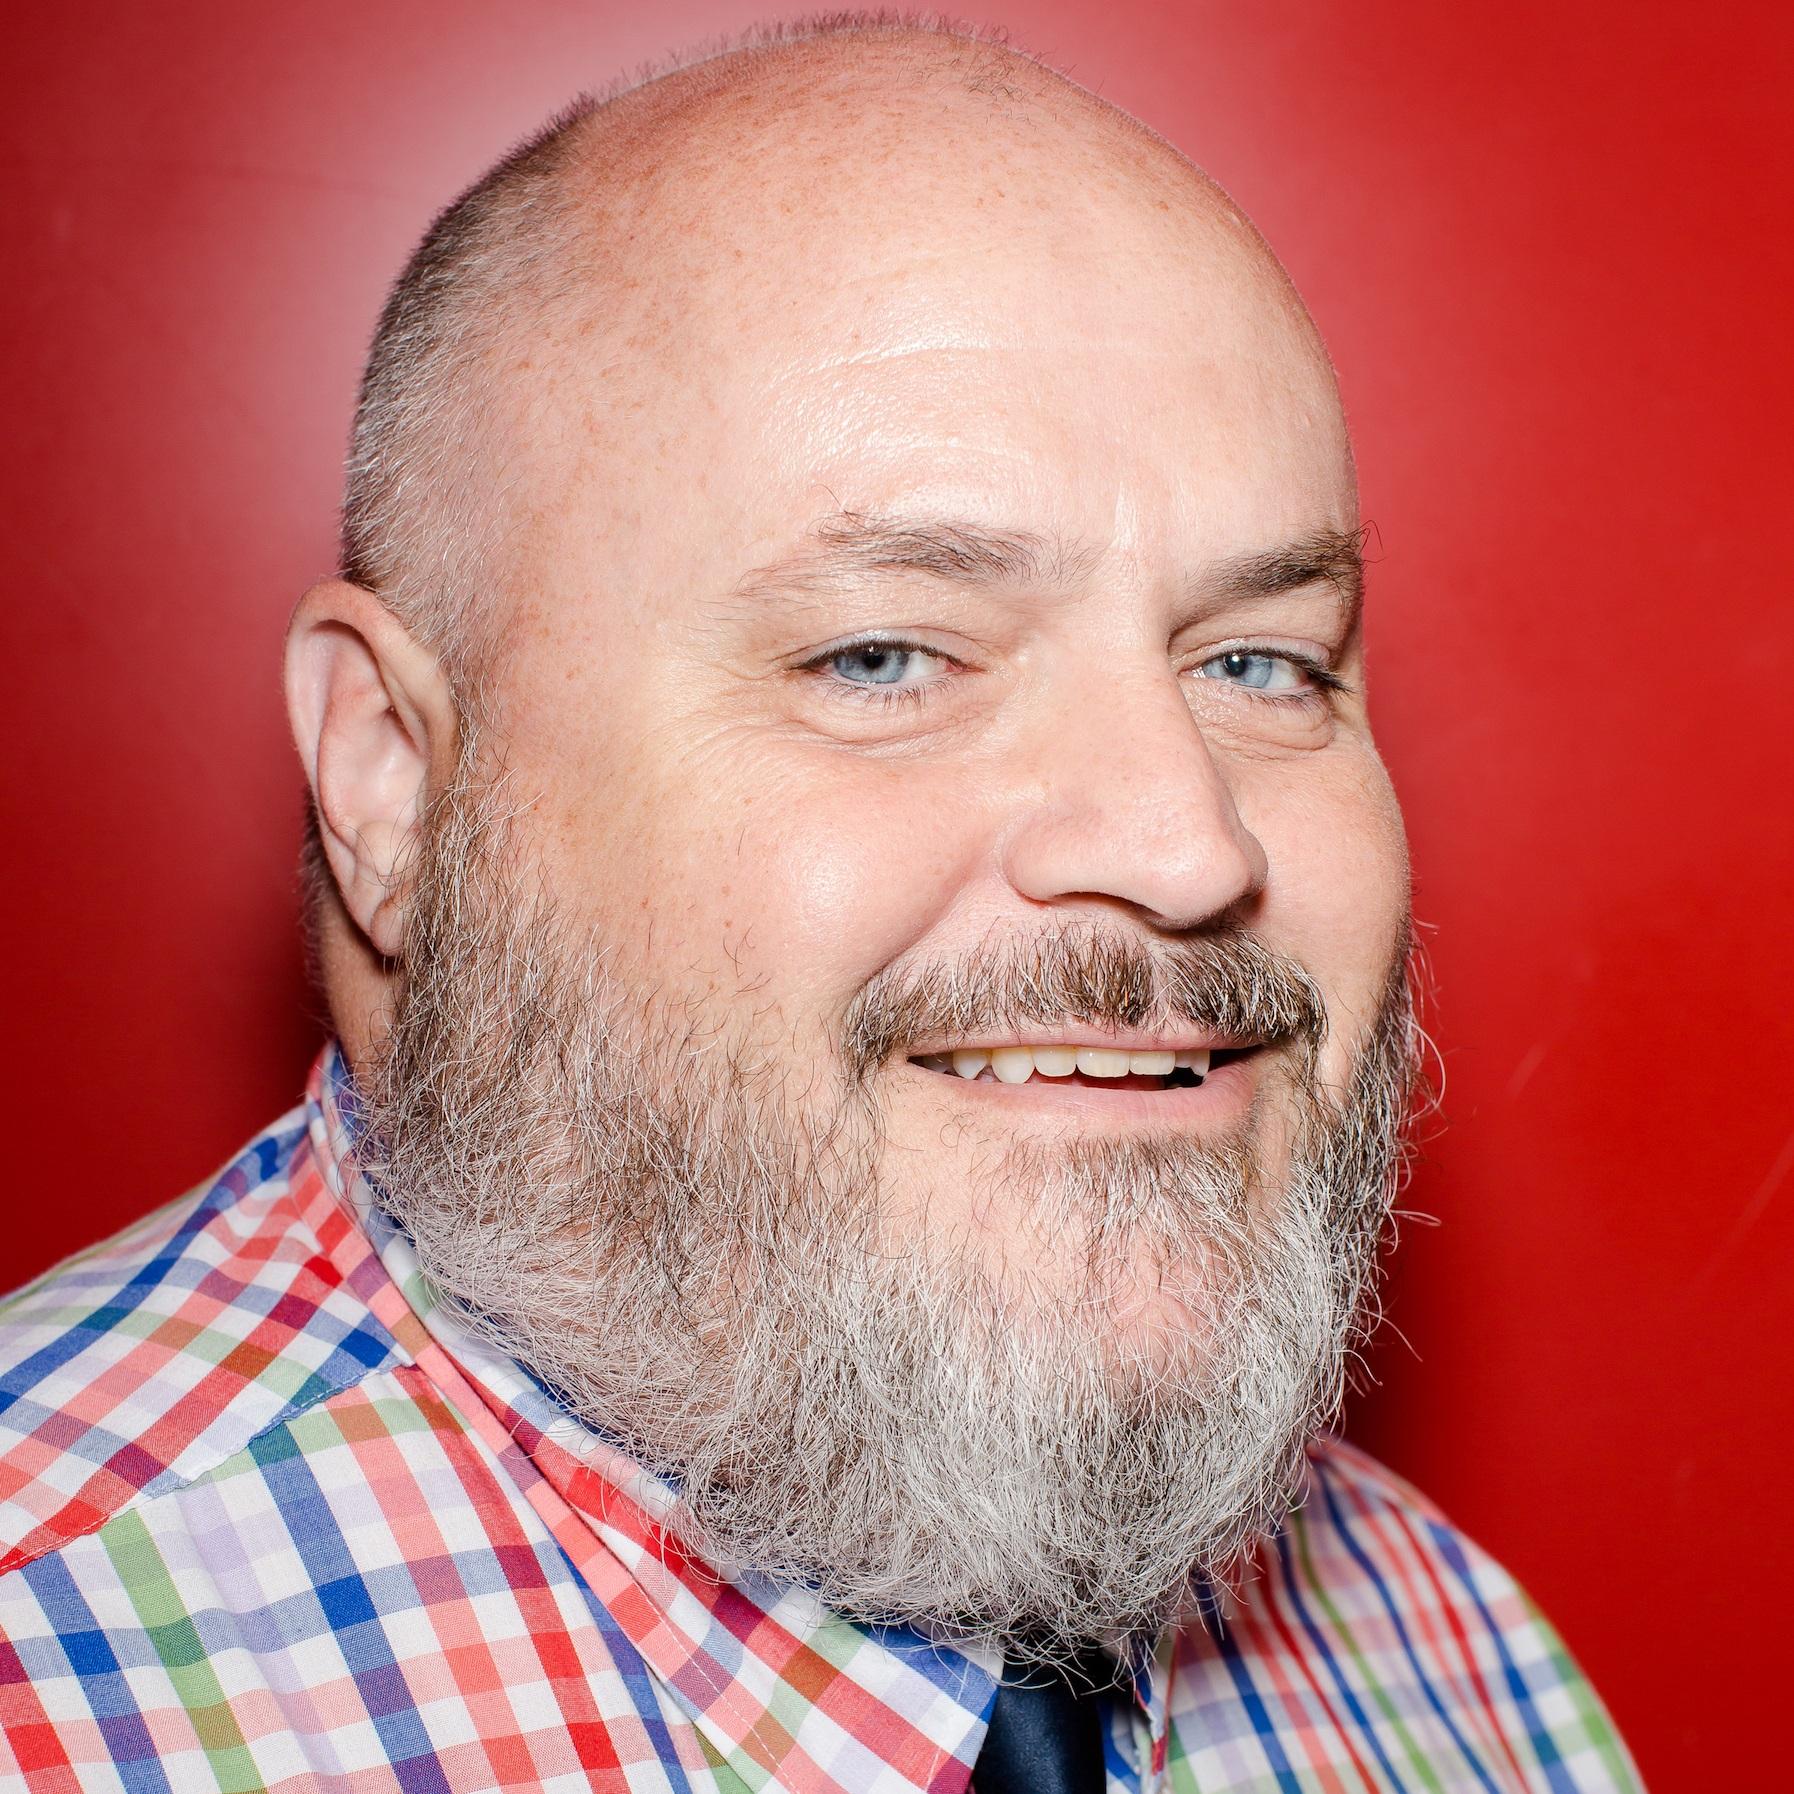 Jim Keaten, Executive Director of Child Nutrition Services for Durham Public Schools